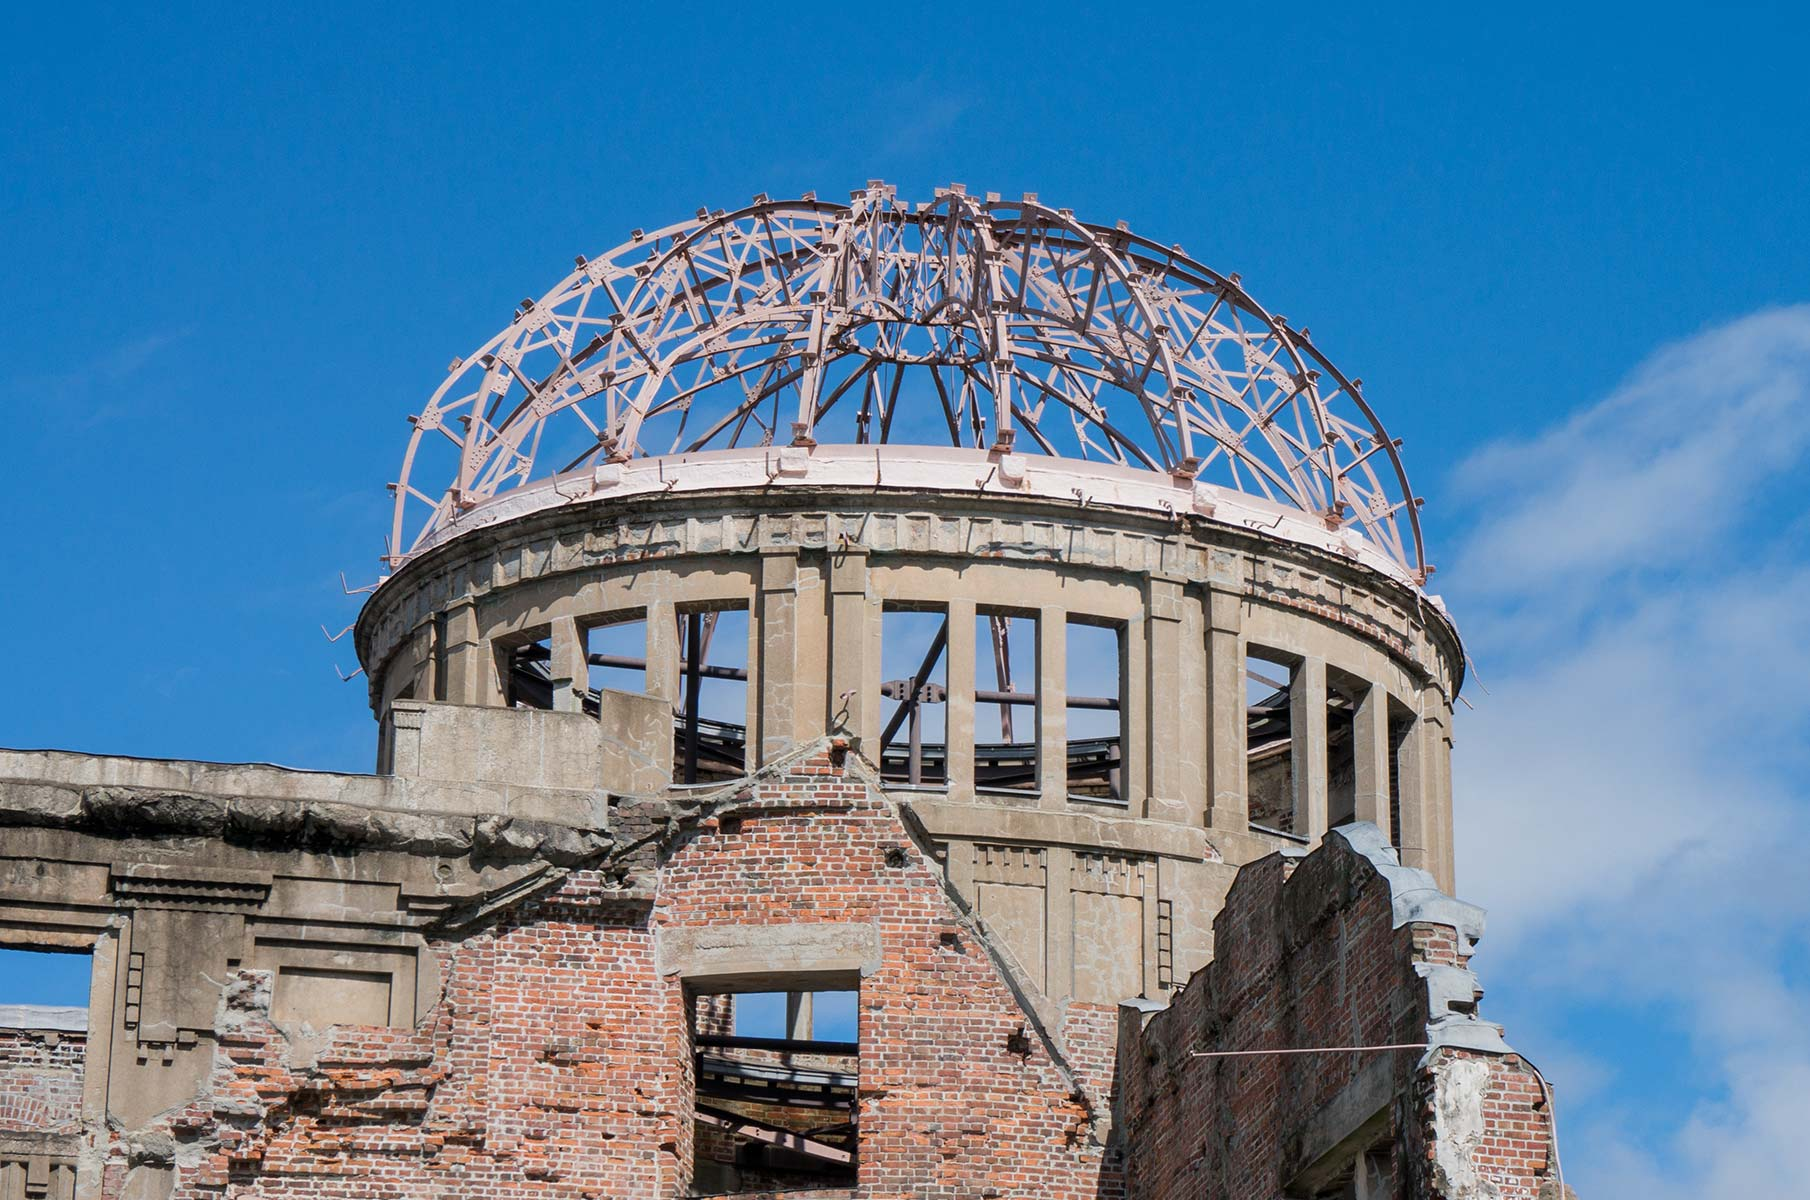 Friedensdenkmal A-Bomb Dom in Hiroshima, Japan